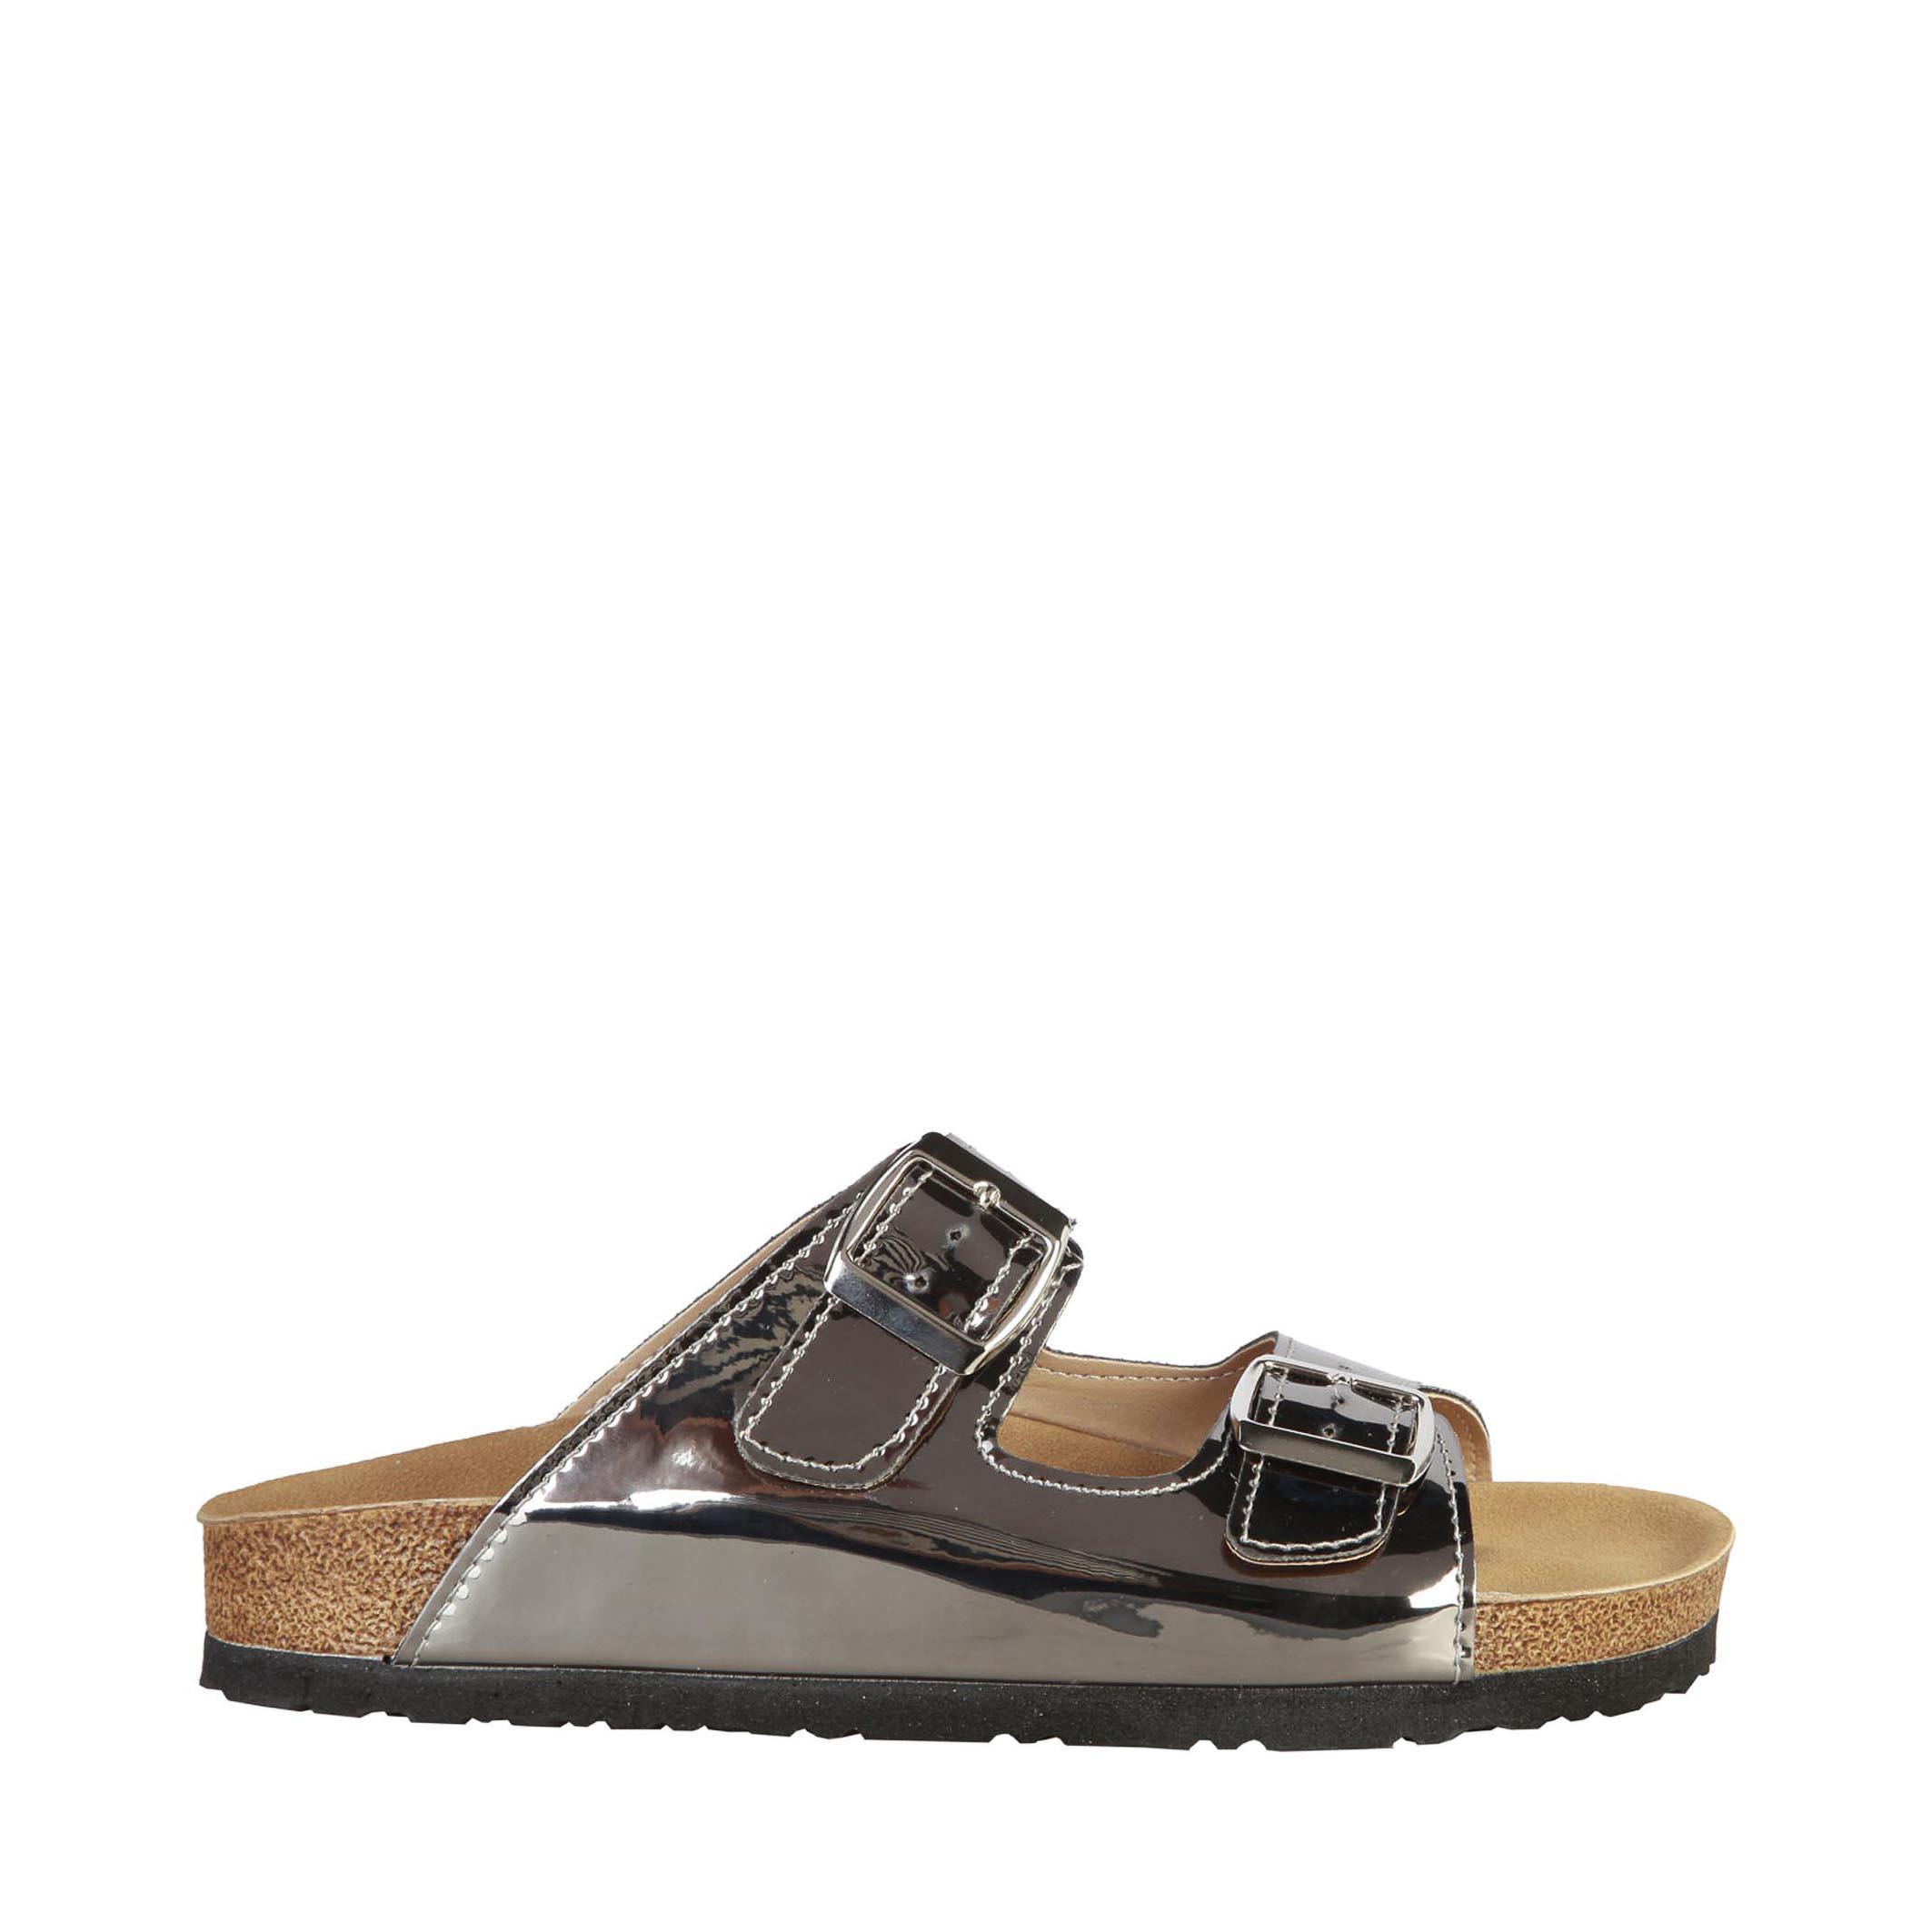 sandale ana lublin agneta antracite